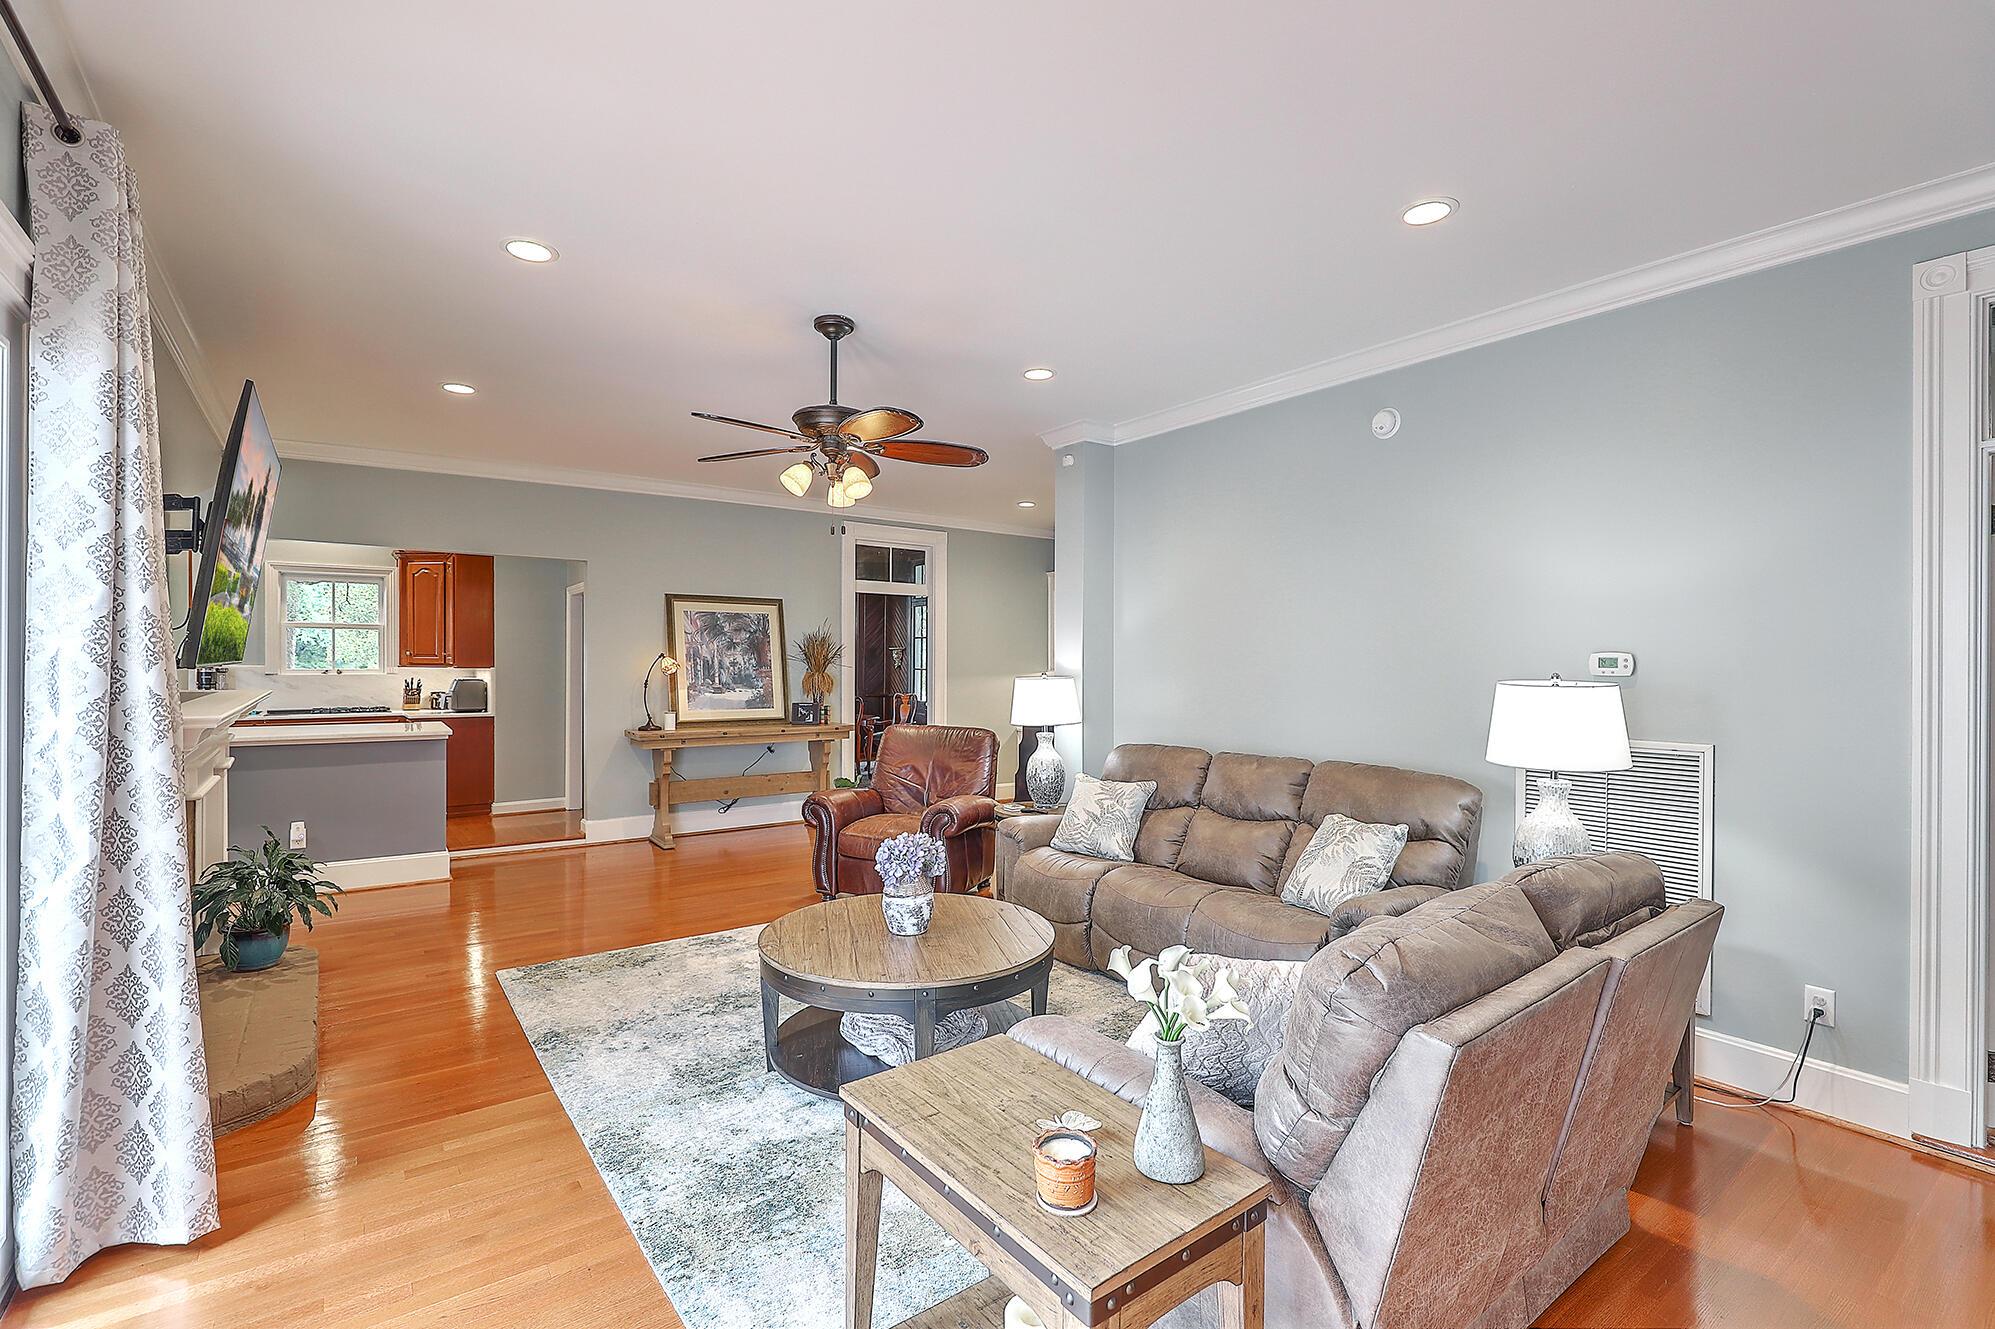 Summerville Homes For Sale - 102 Hickory, Summerville, SC - 61